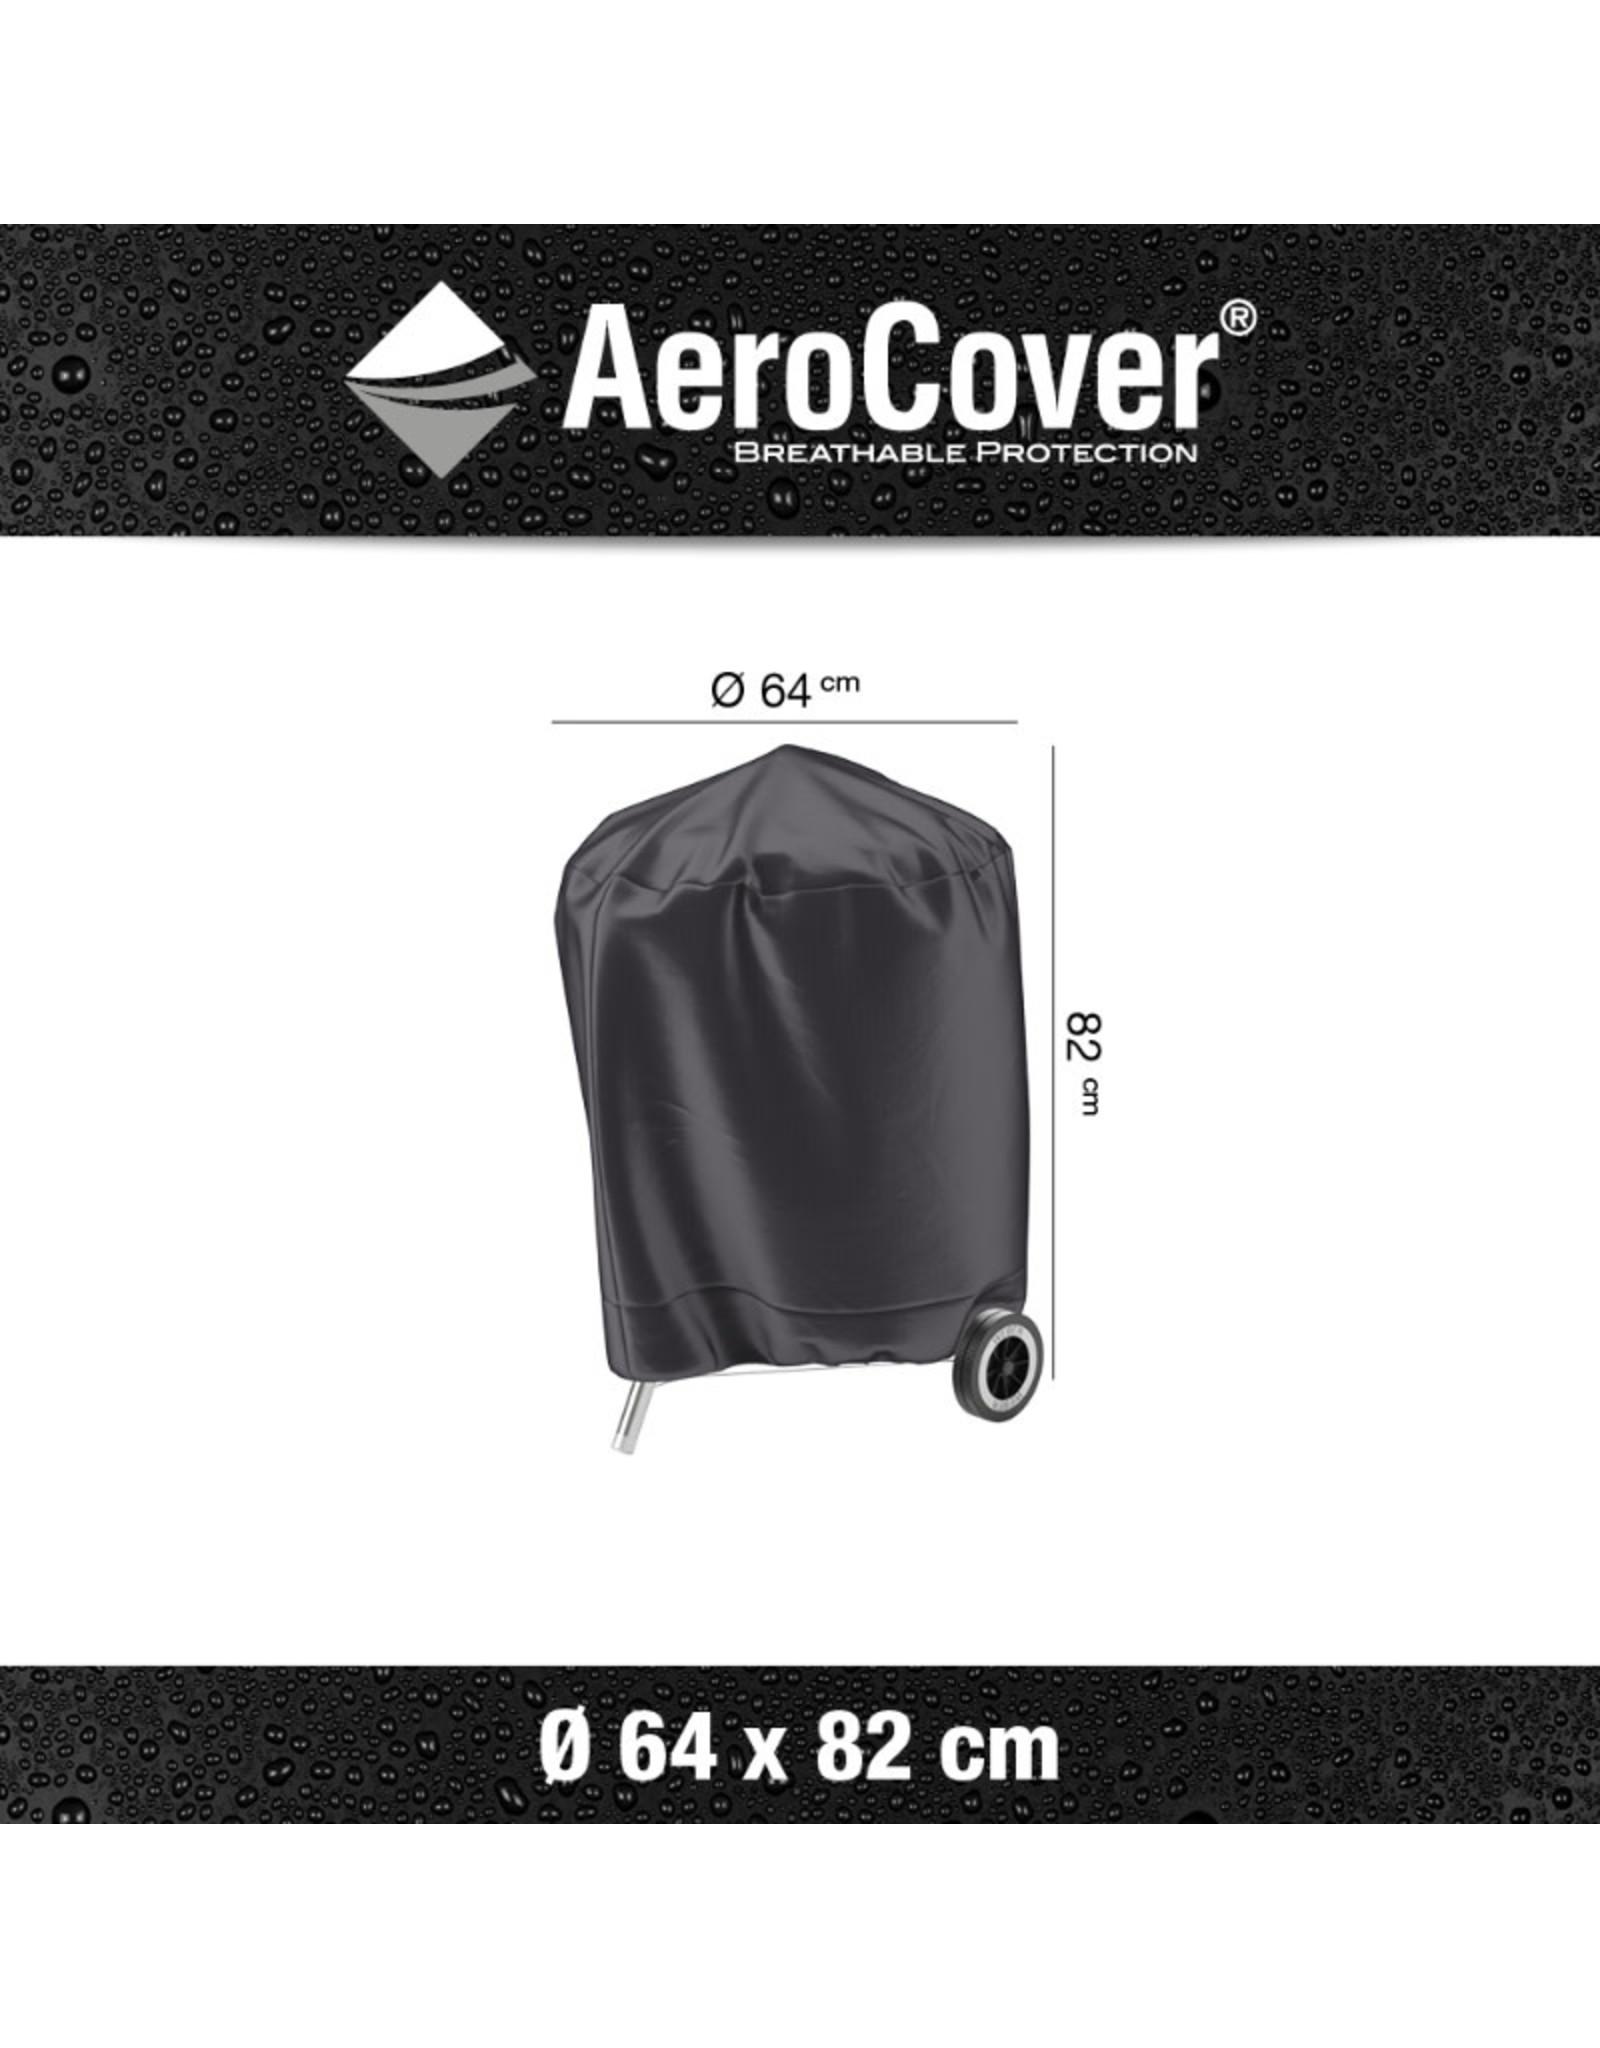 Aerocover AeroCover BBQ cover around 64cm